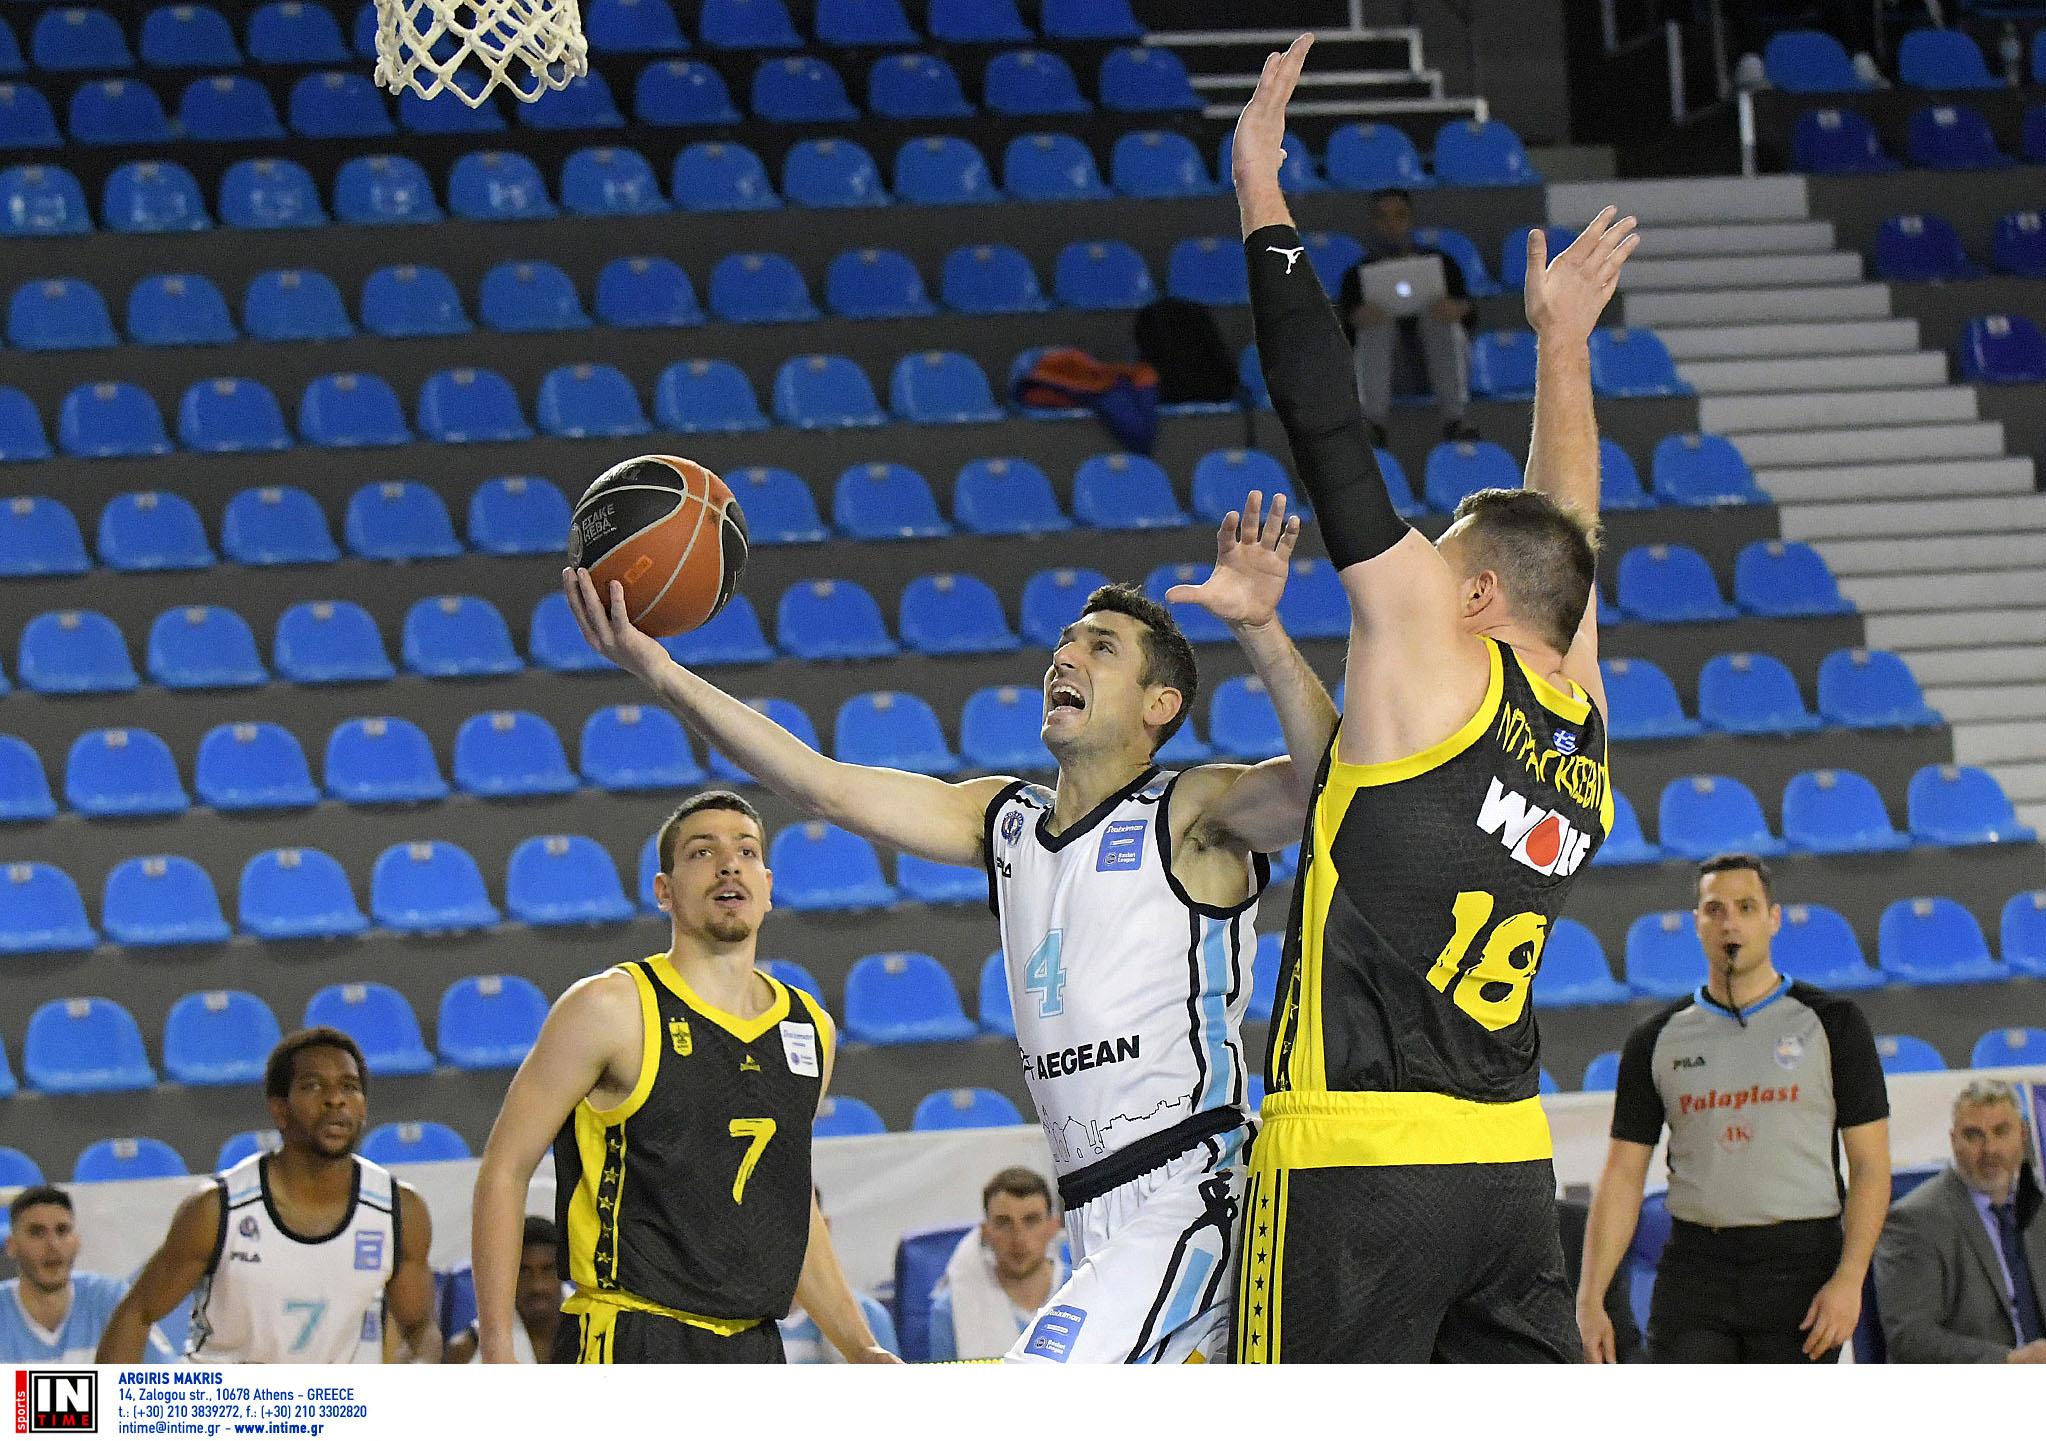 Basket League: Άρης και Κολοσσός παραμένουν χωρίς πιστοποιητικό συμμετοχής